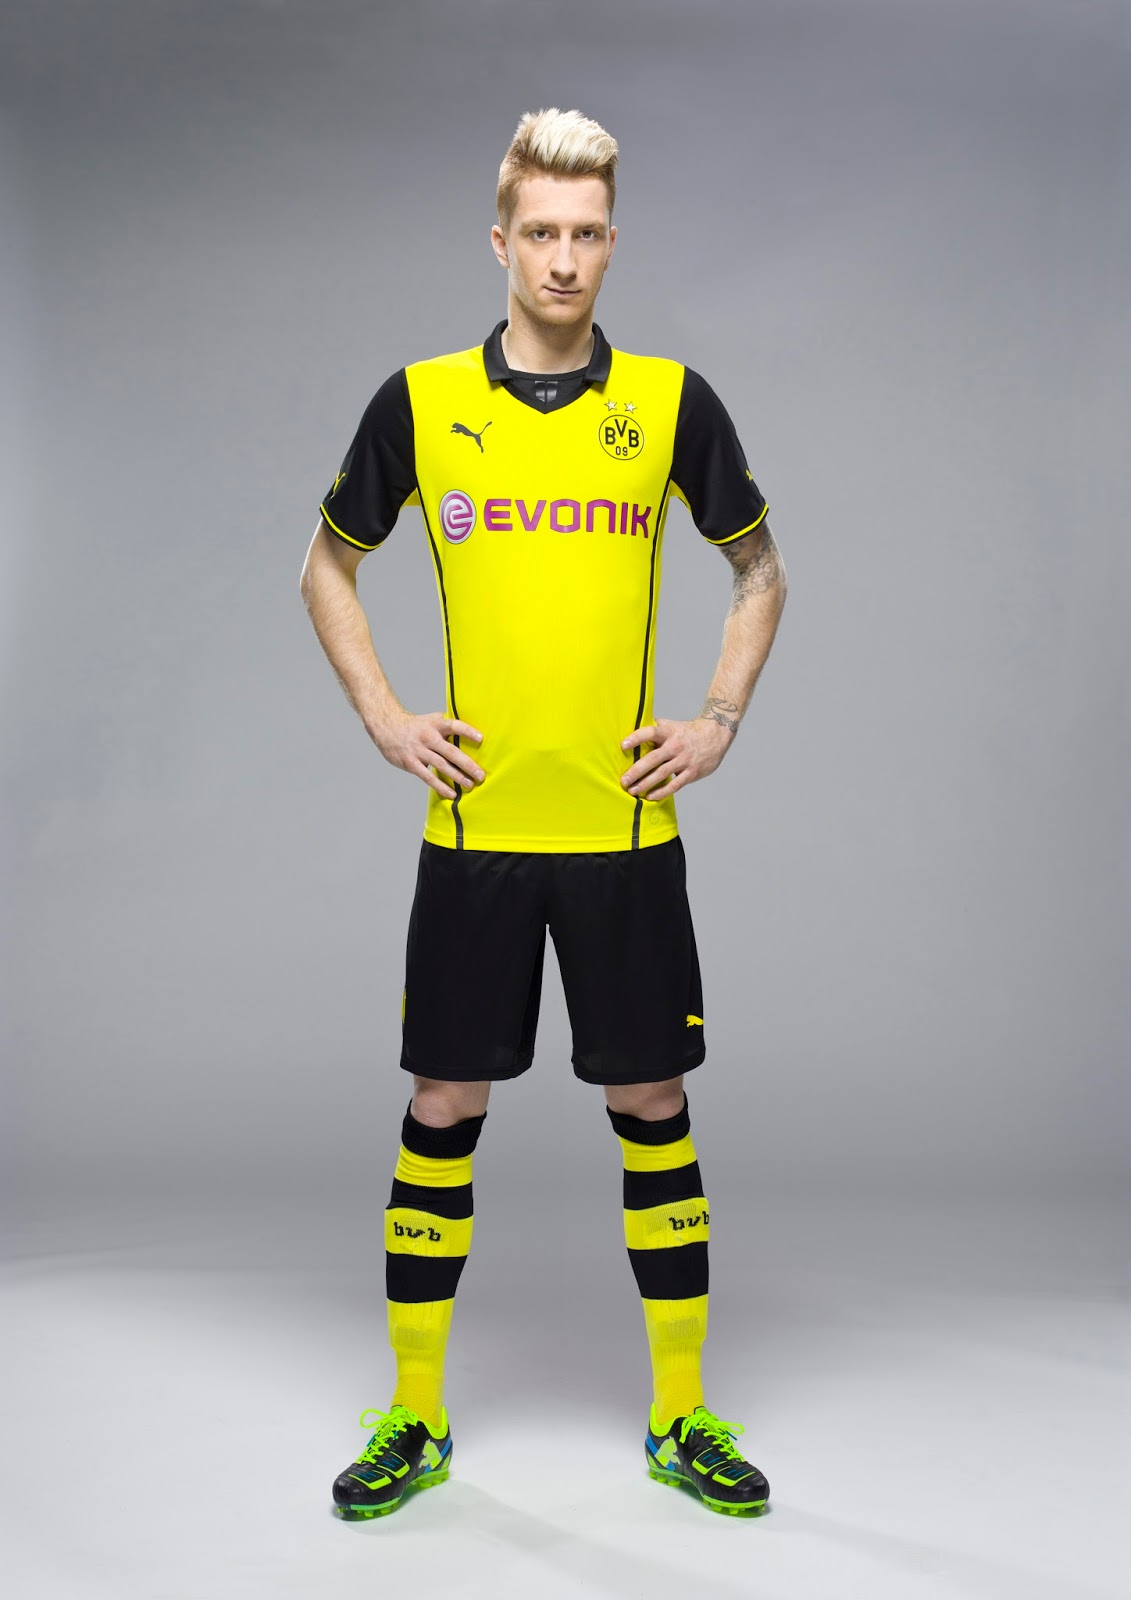 Borussia Dortmund 13-14 (2013-14) Champions League Kit ...